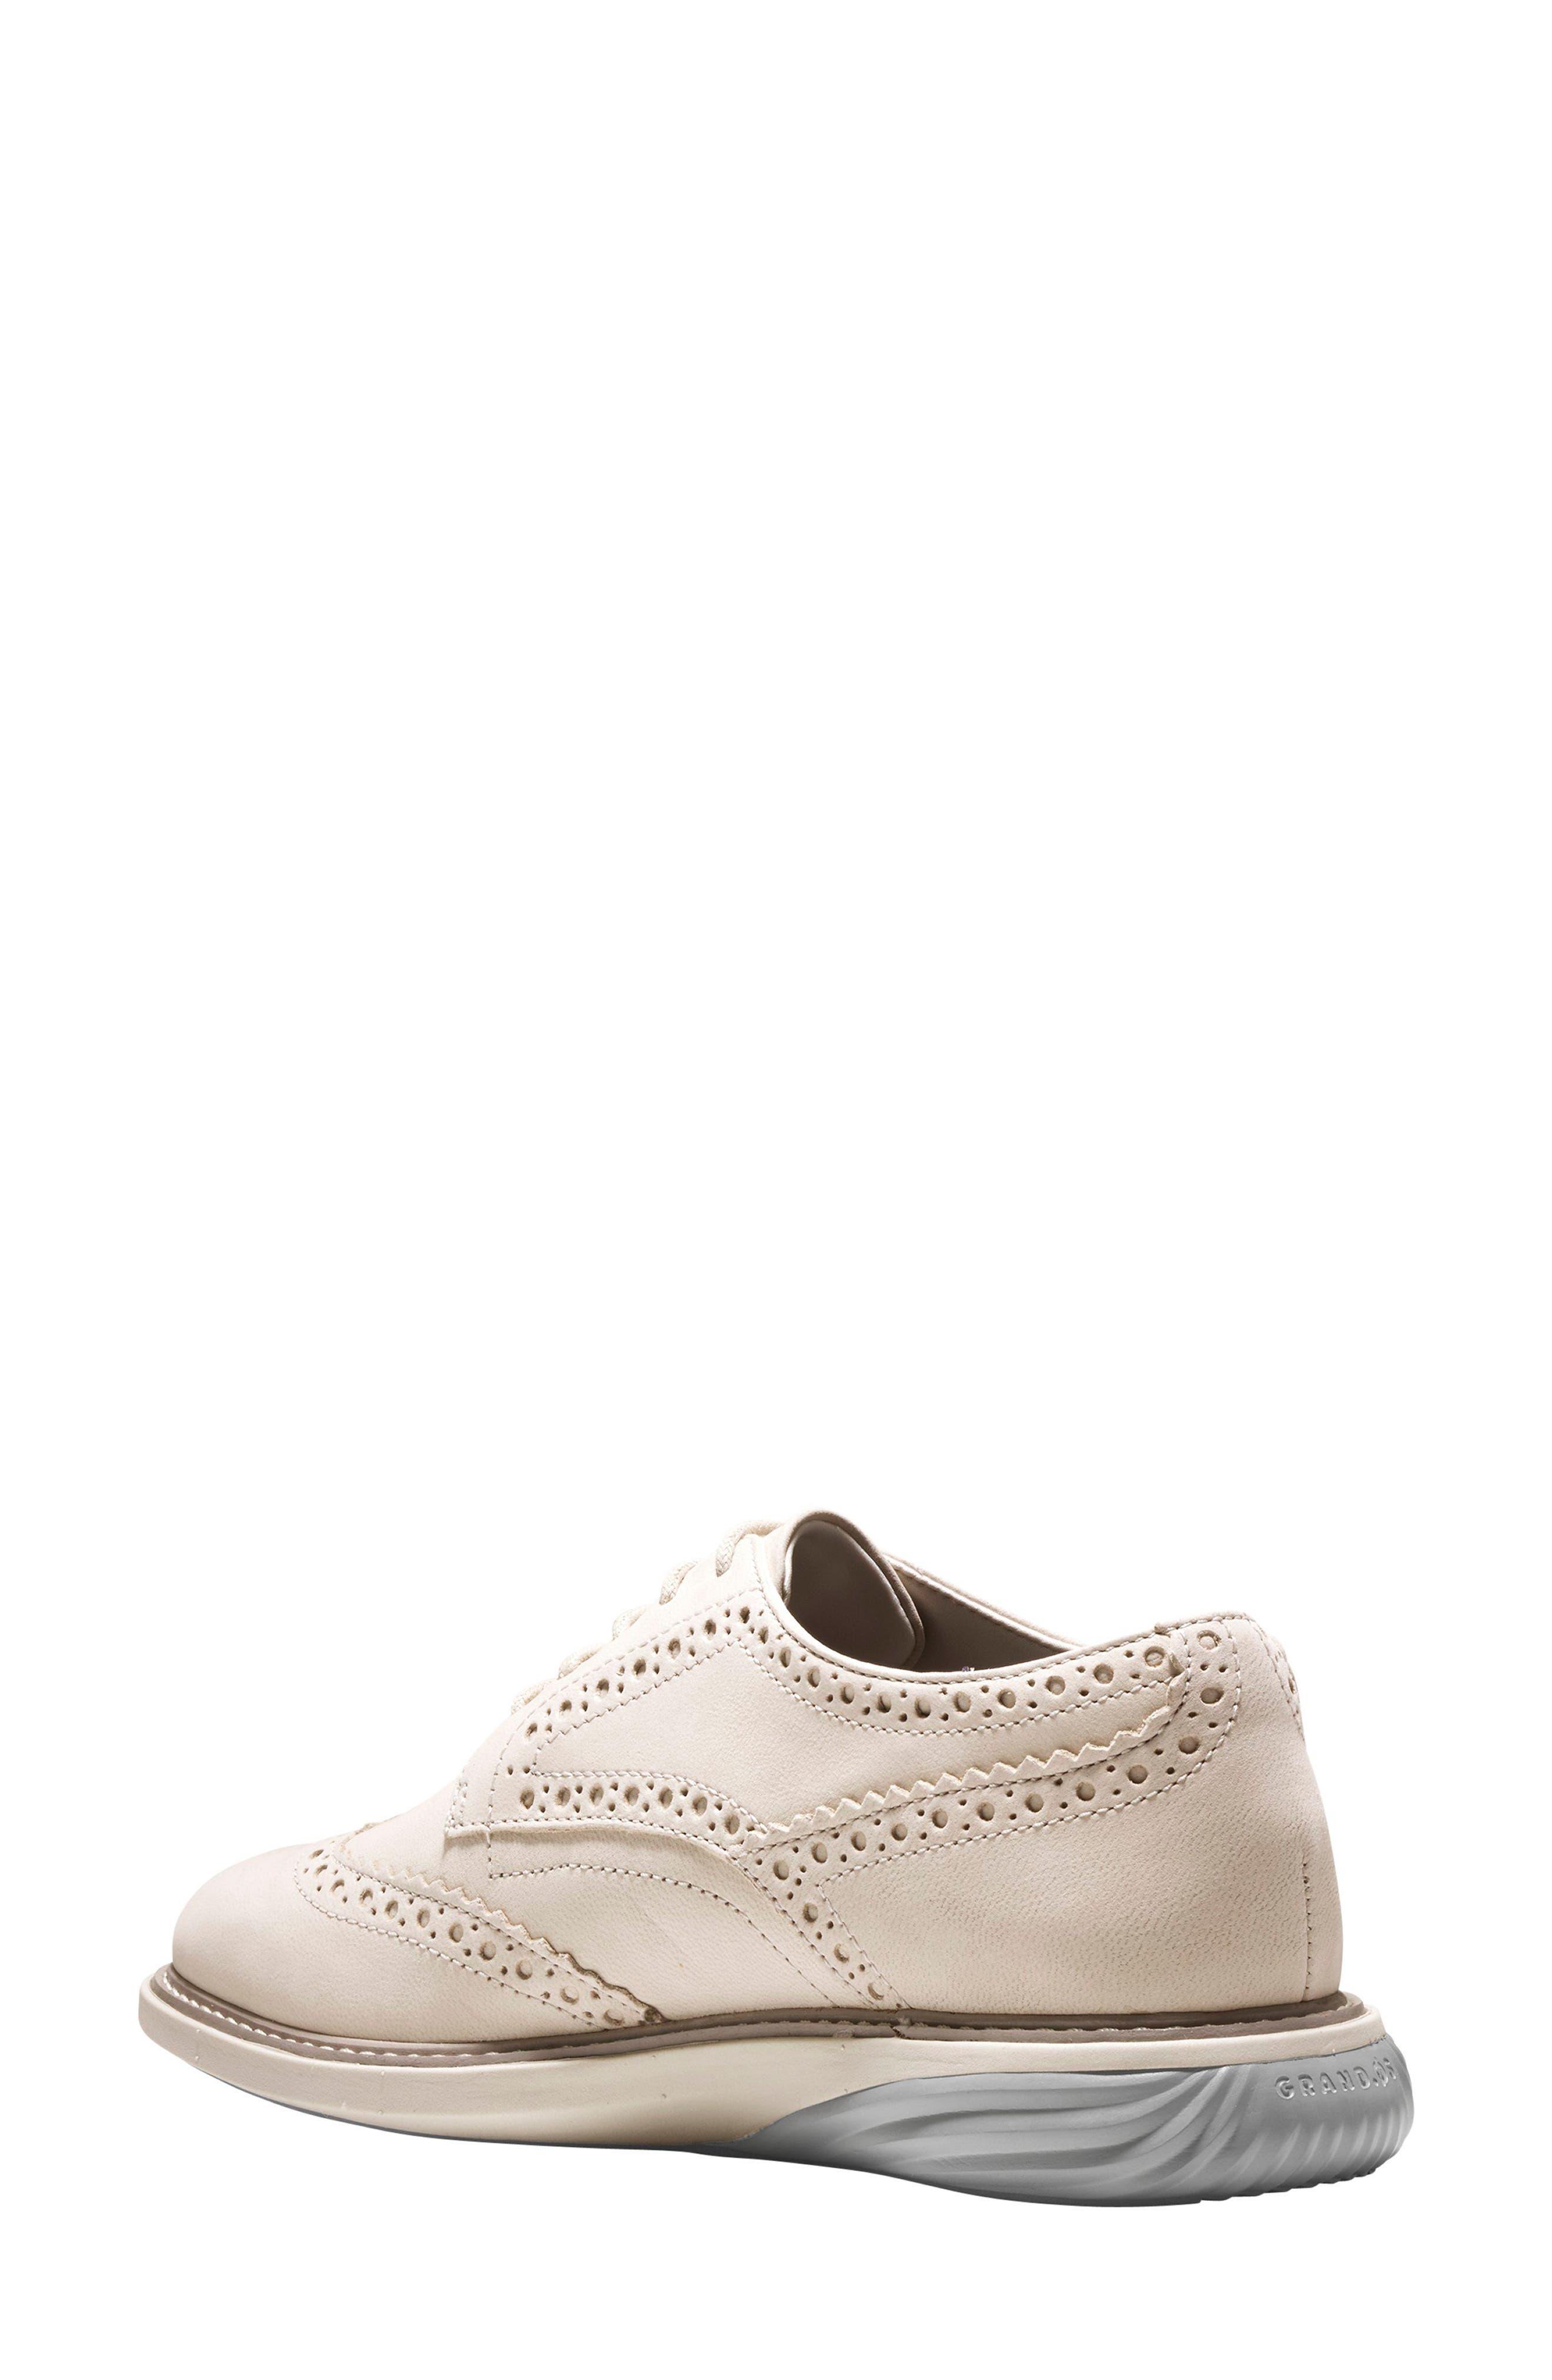 Grandevolution Shortwing Oxford Sneaker,                             Alternate thumbnail 2, color,                             Pumice Stone Nubuck